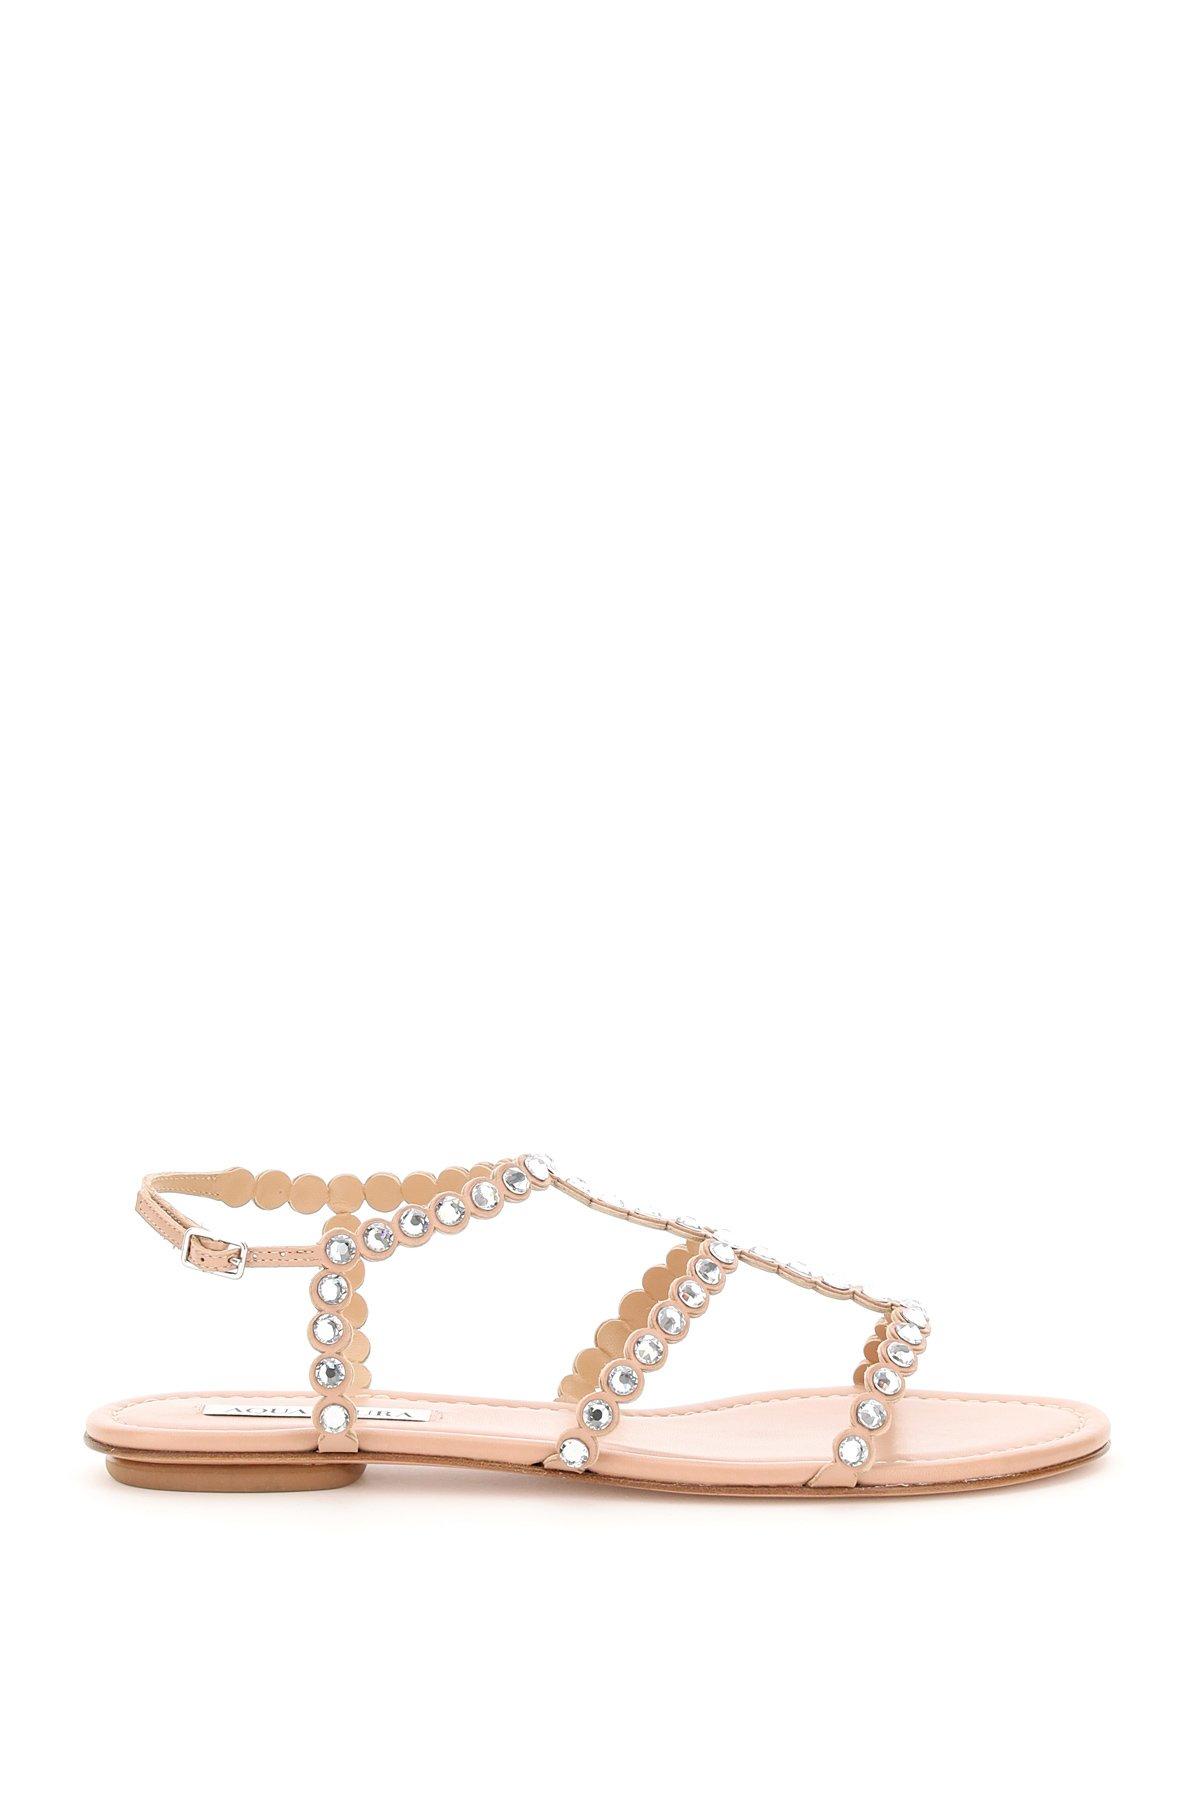 Aquazzura sandali tequila flat